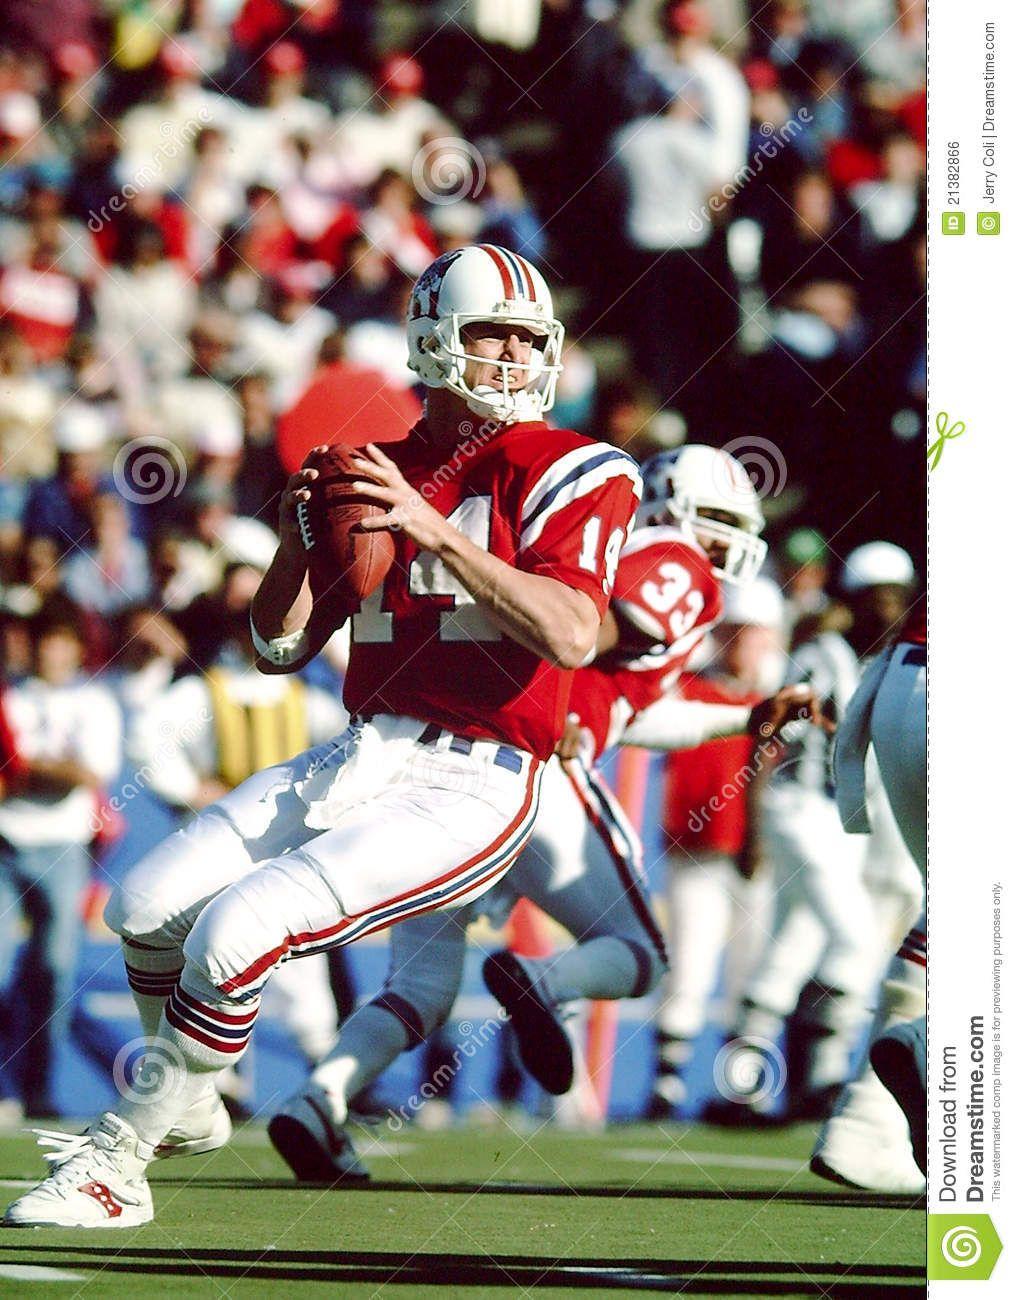 Curtis Martin Nfl Uniforms Nfl New England Patriots New England Patriots Football